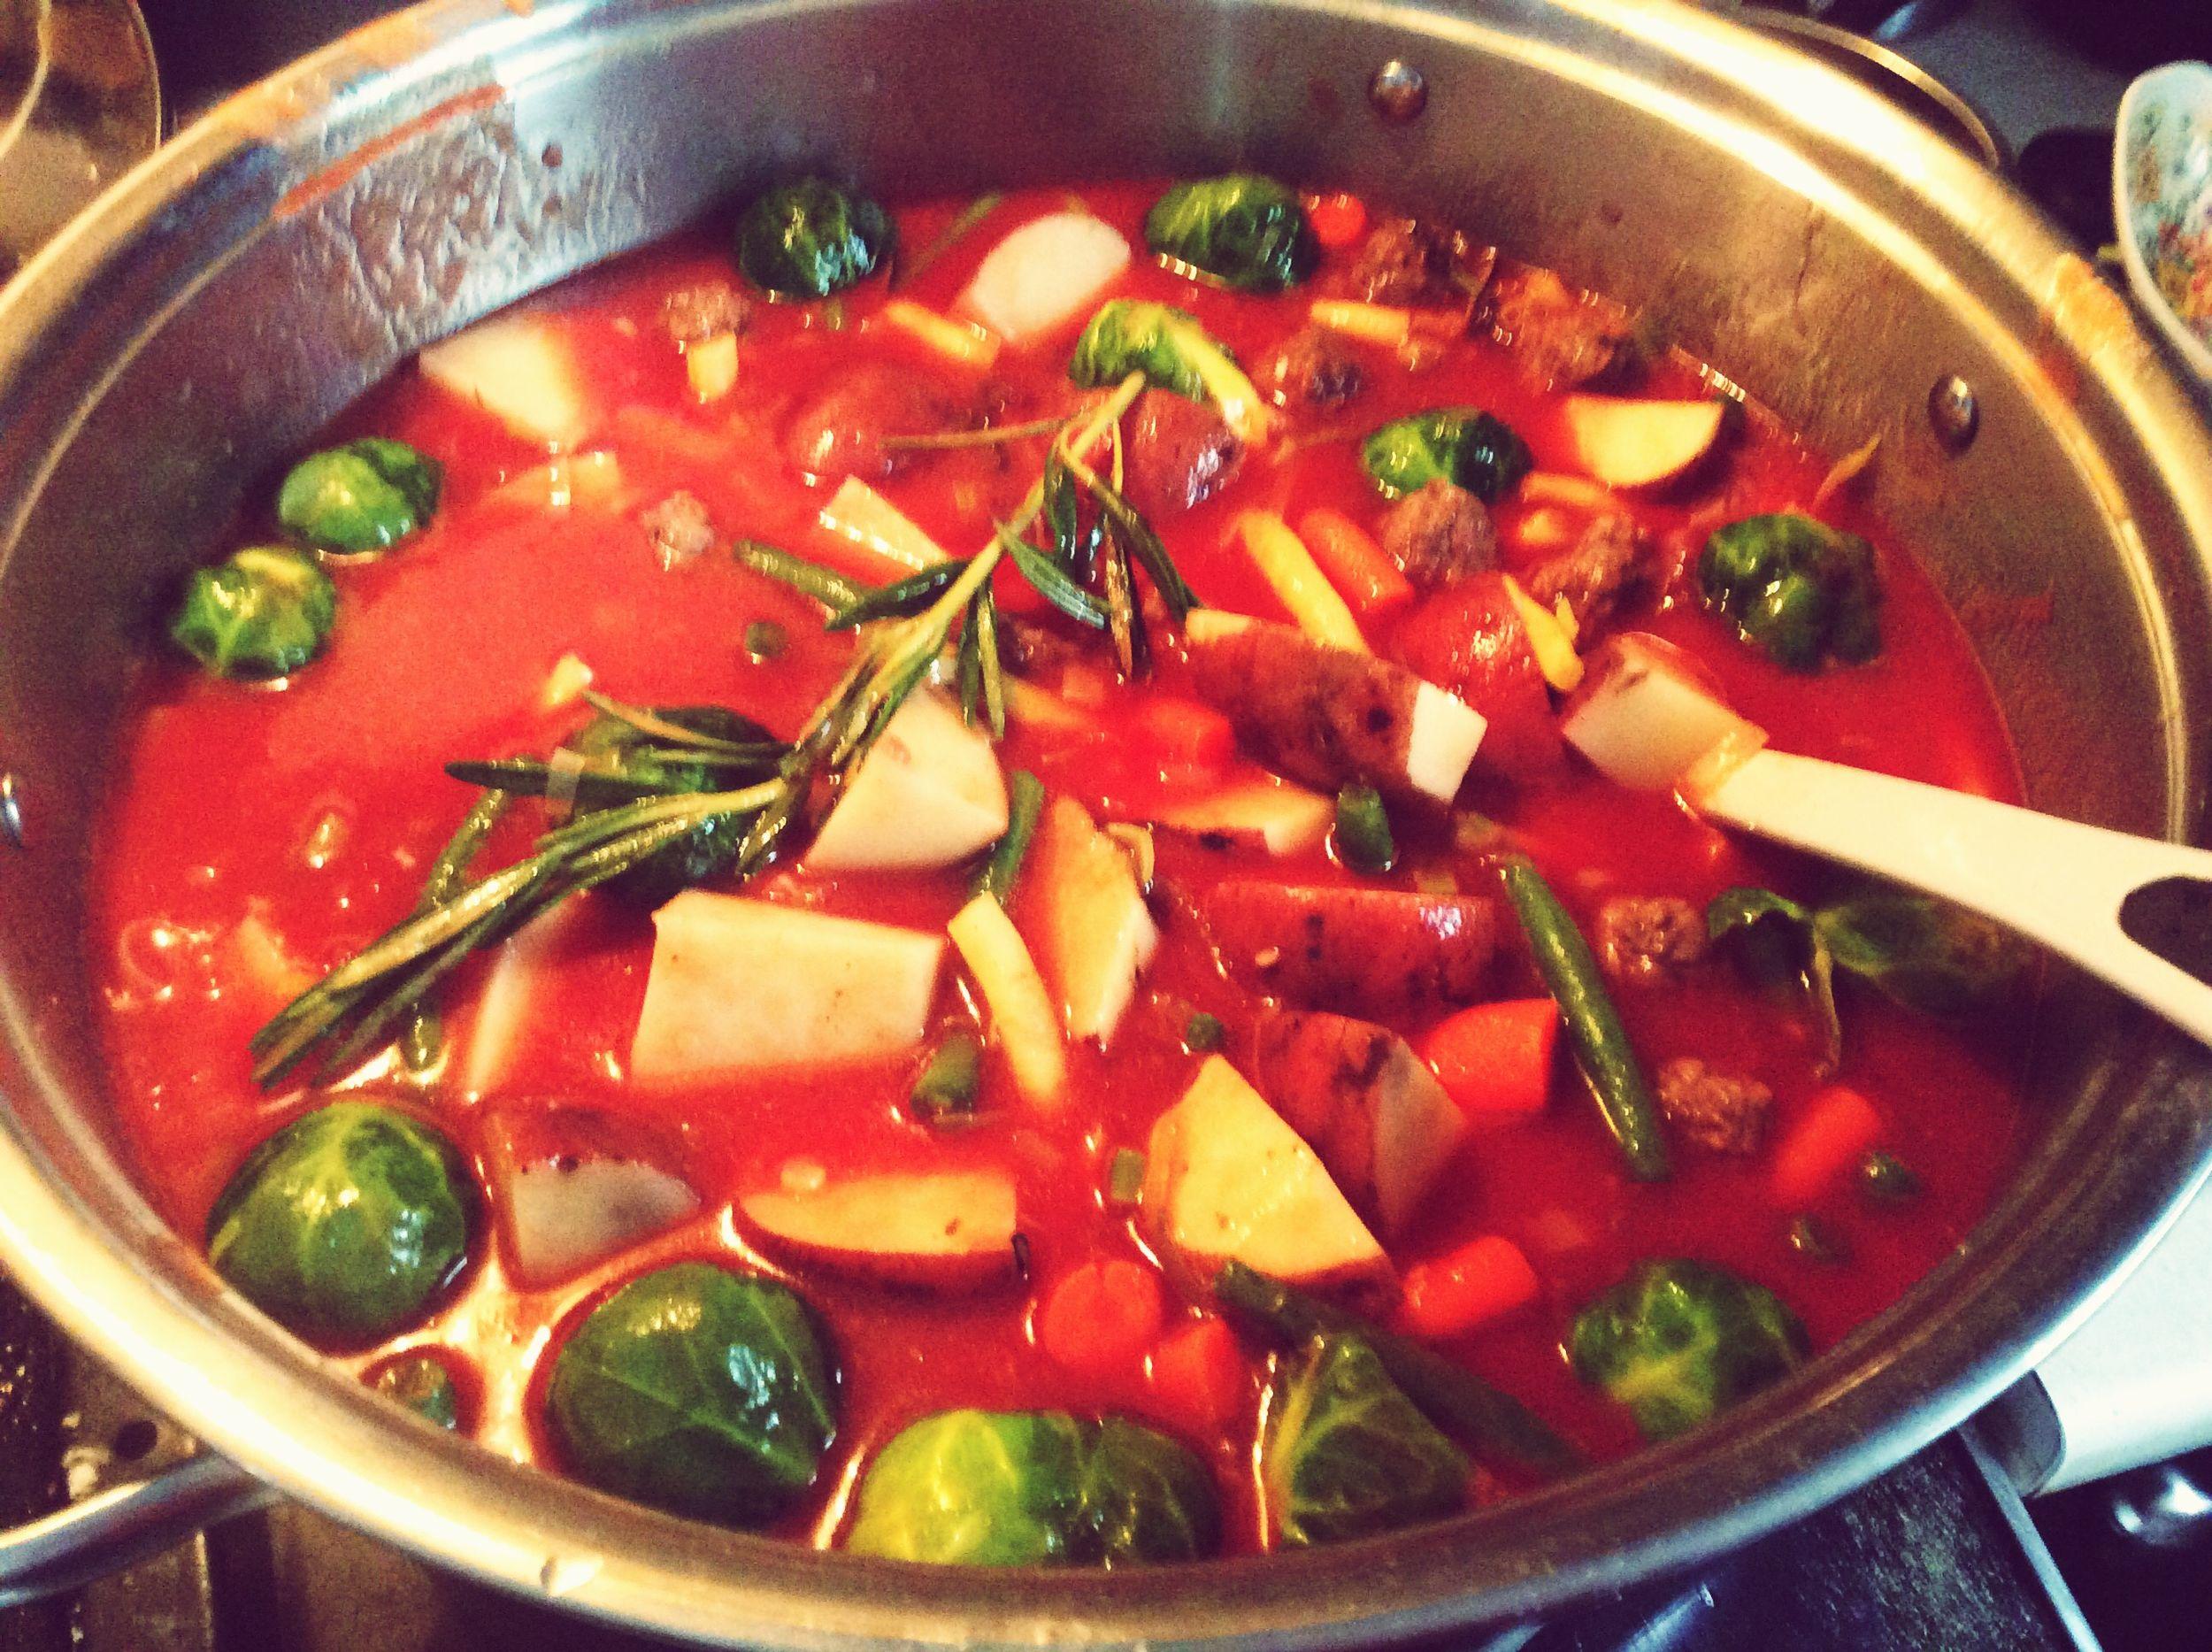 Stew Souvenir D'enfance What's For Dinner? Mealtime